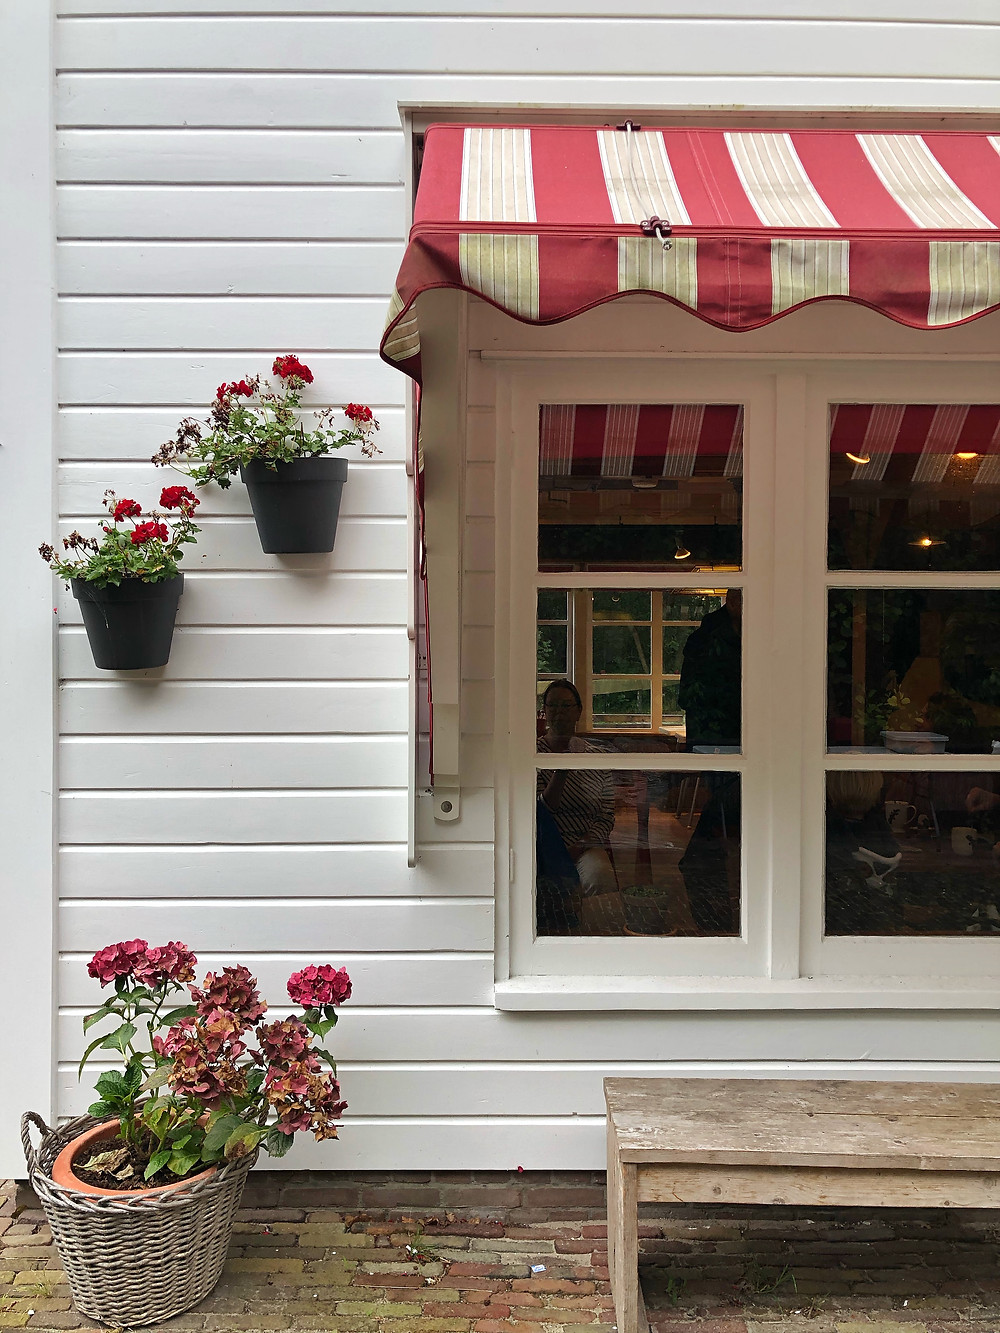 De Bessenschuur (cranberry shed) at Terschelling